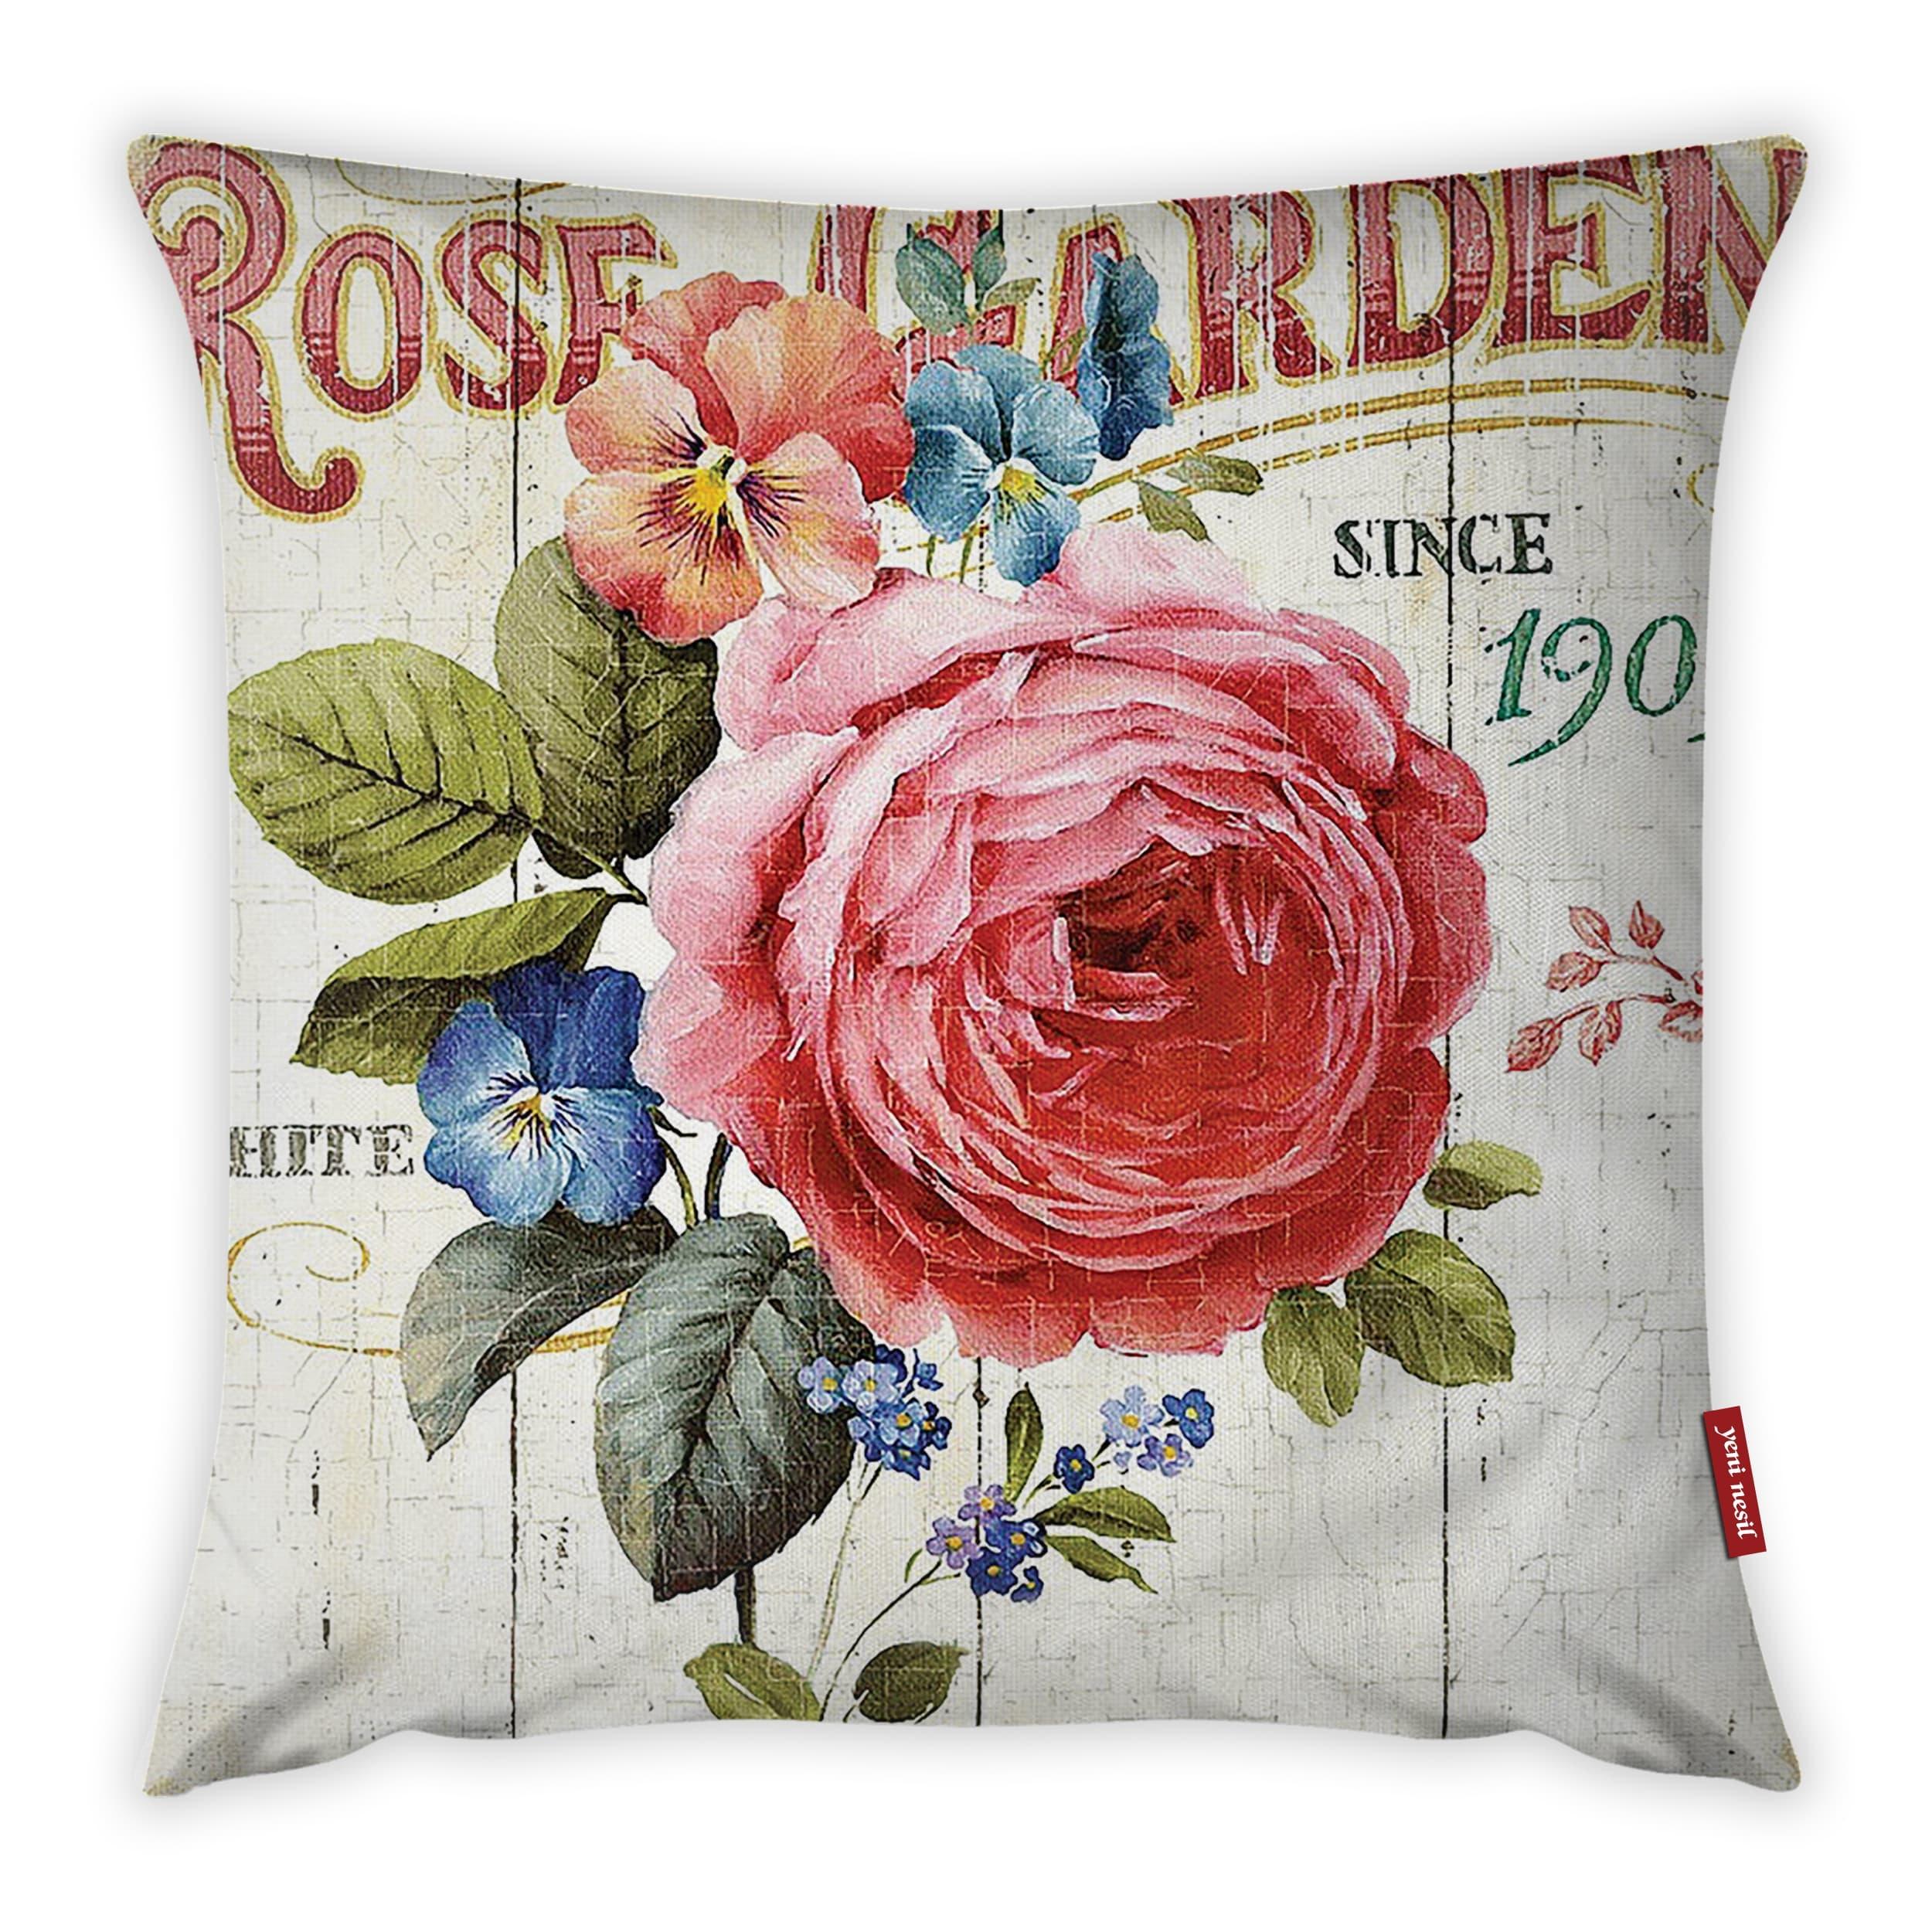 Fata de perna Roses Garden YK1068 Multicolor, 42 x 42 cm